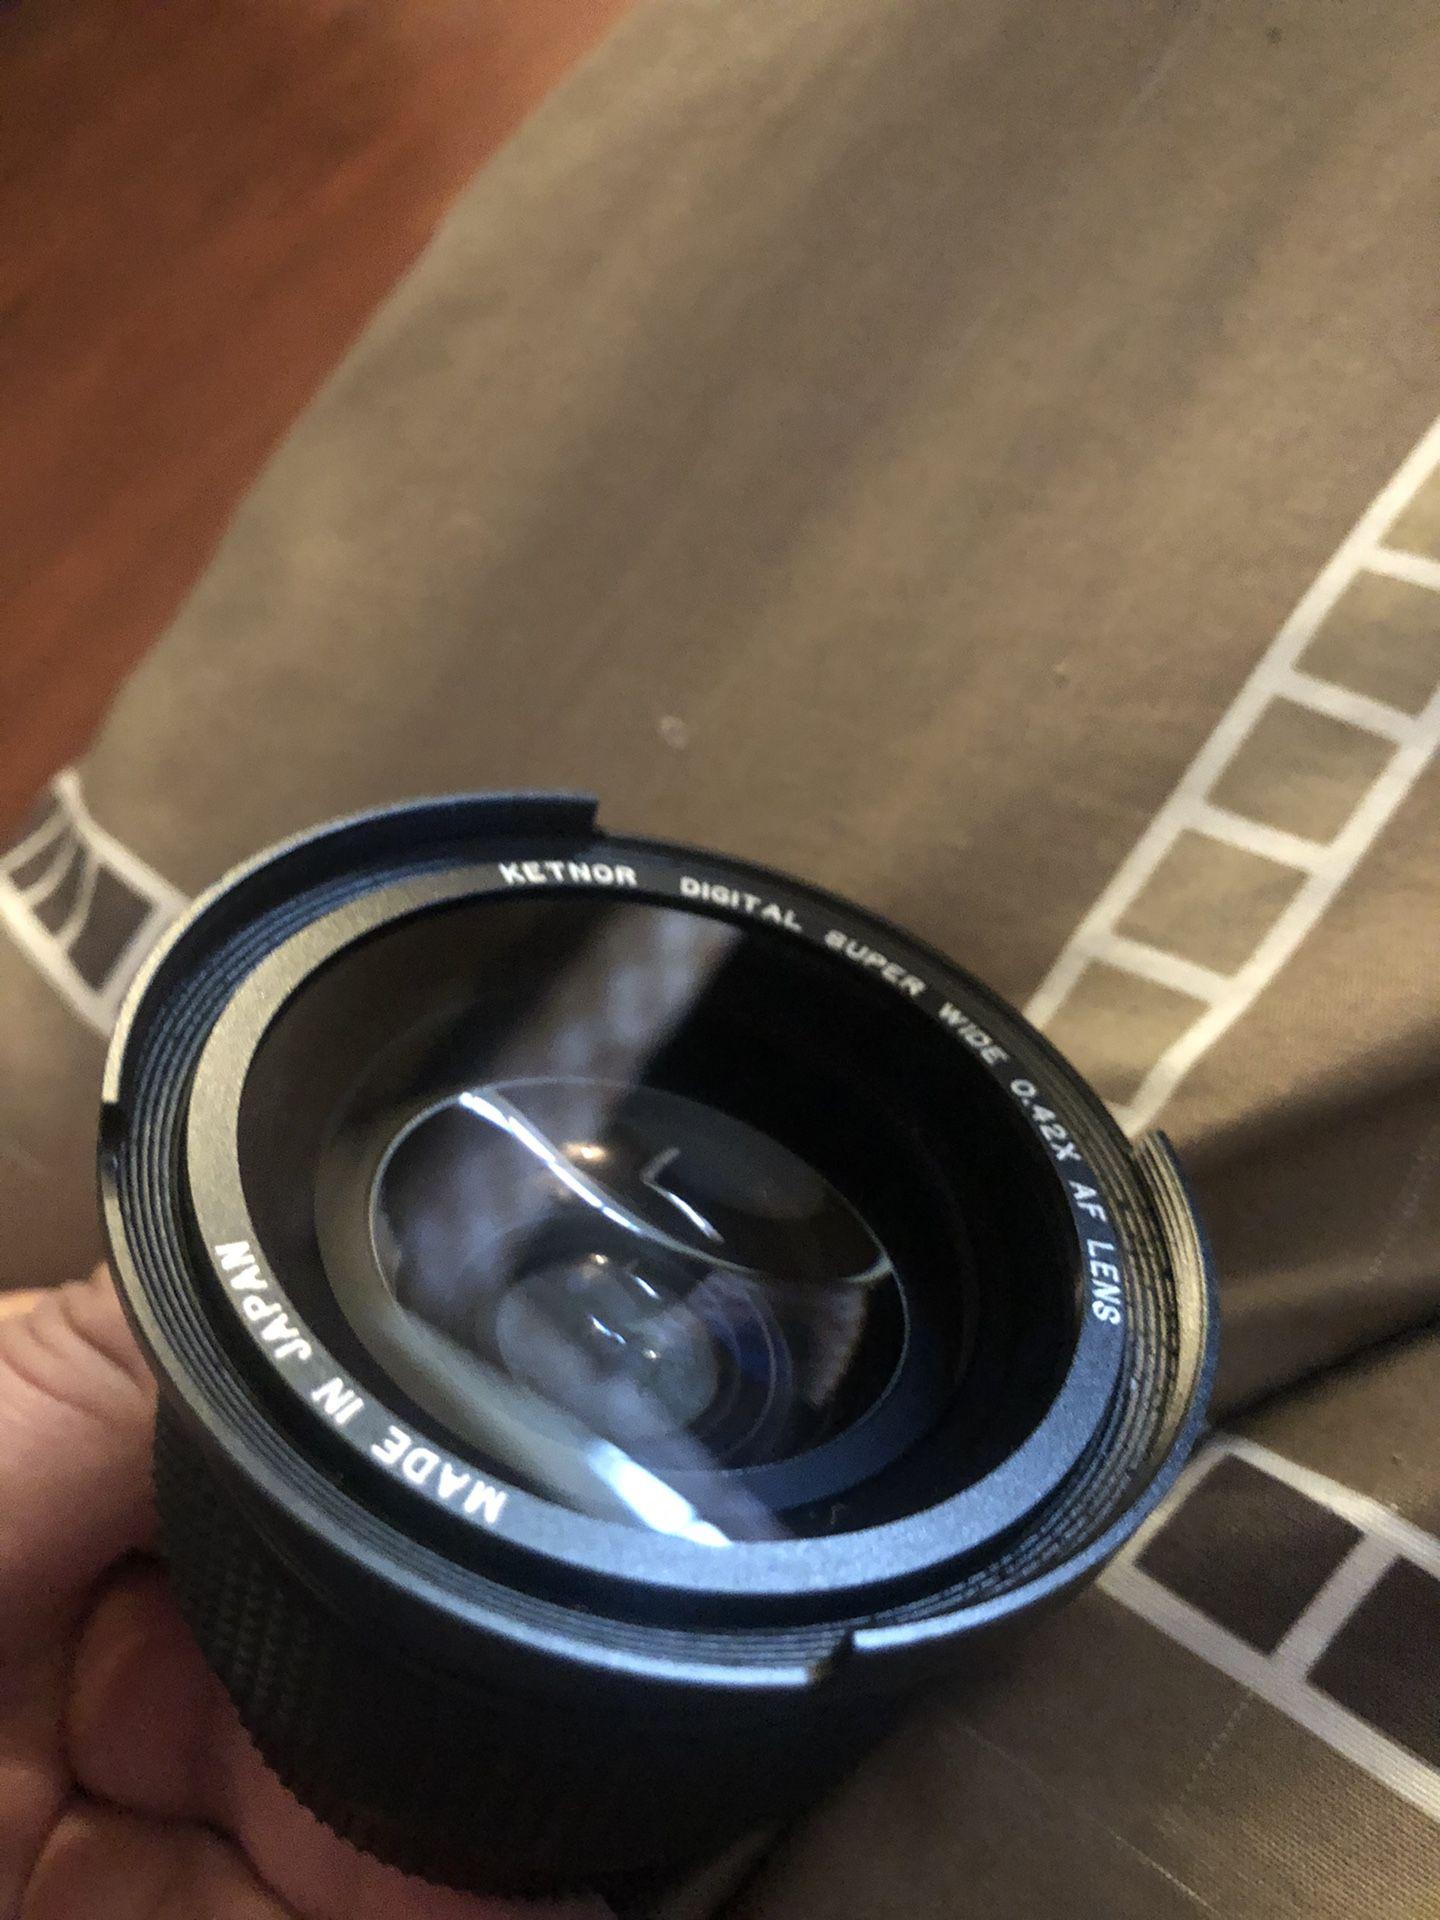 Ketnor Digital Super Wide 0.42x Macro